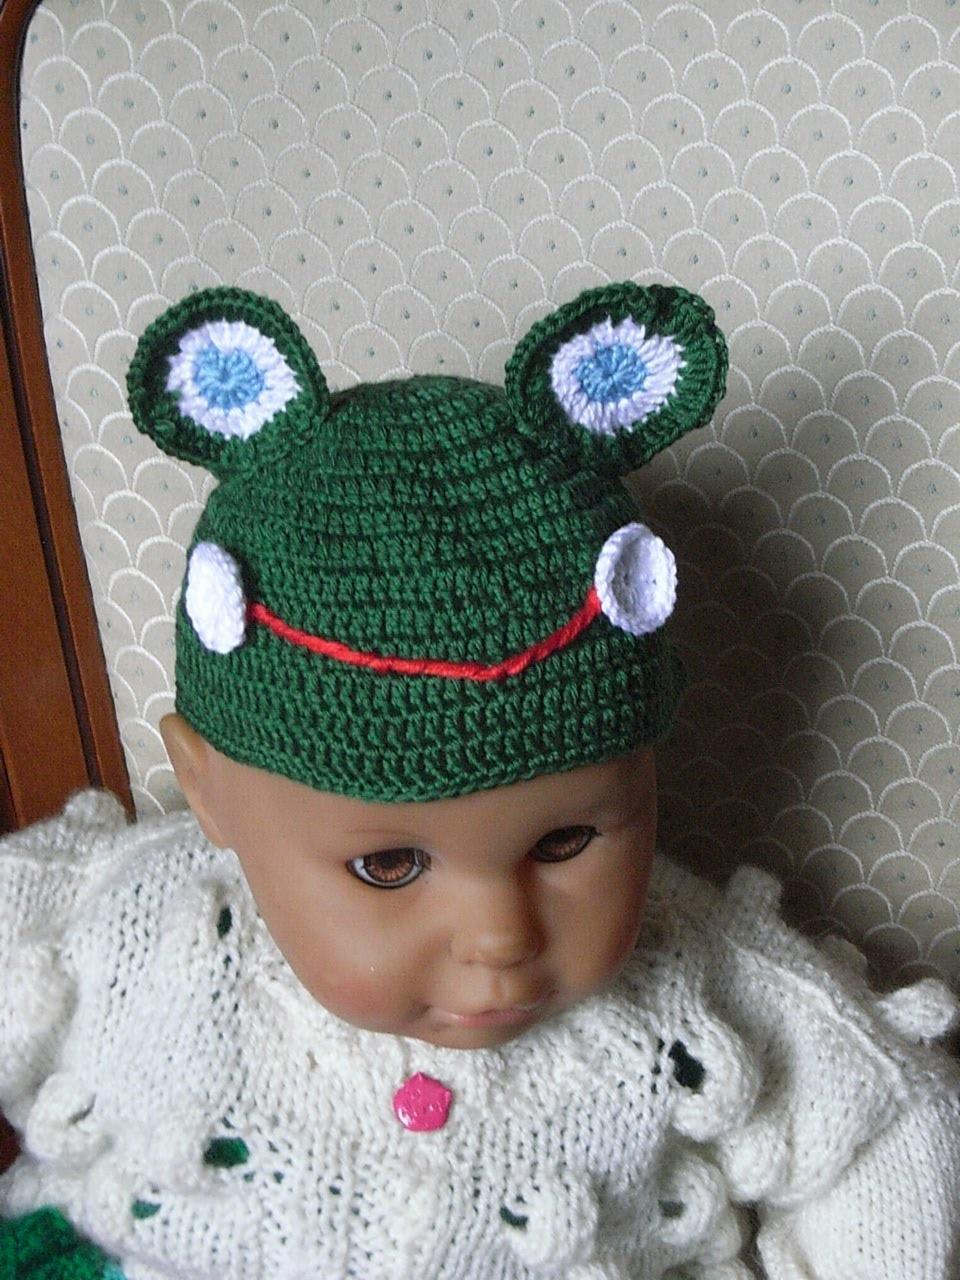 Frosch Baby Mütze Häkeln*Frog  Baby hat crochet*Tutorial Handarbeit